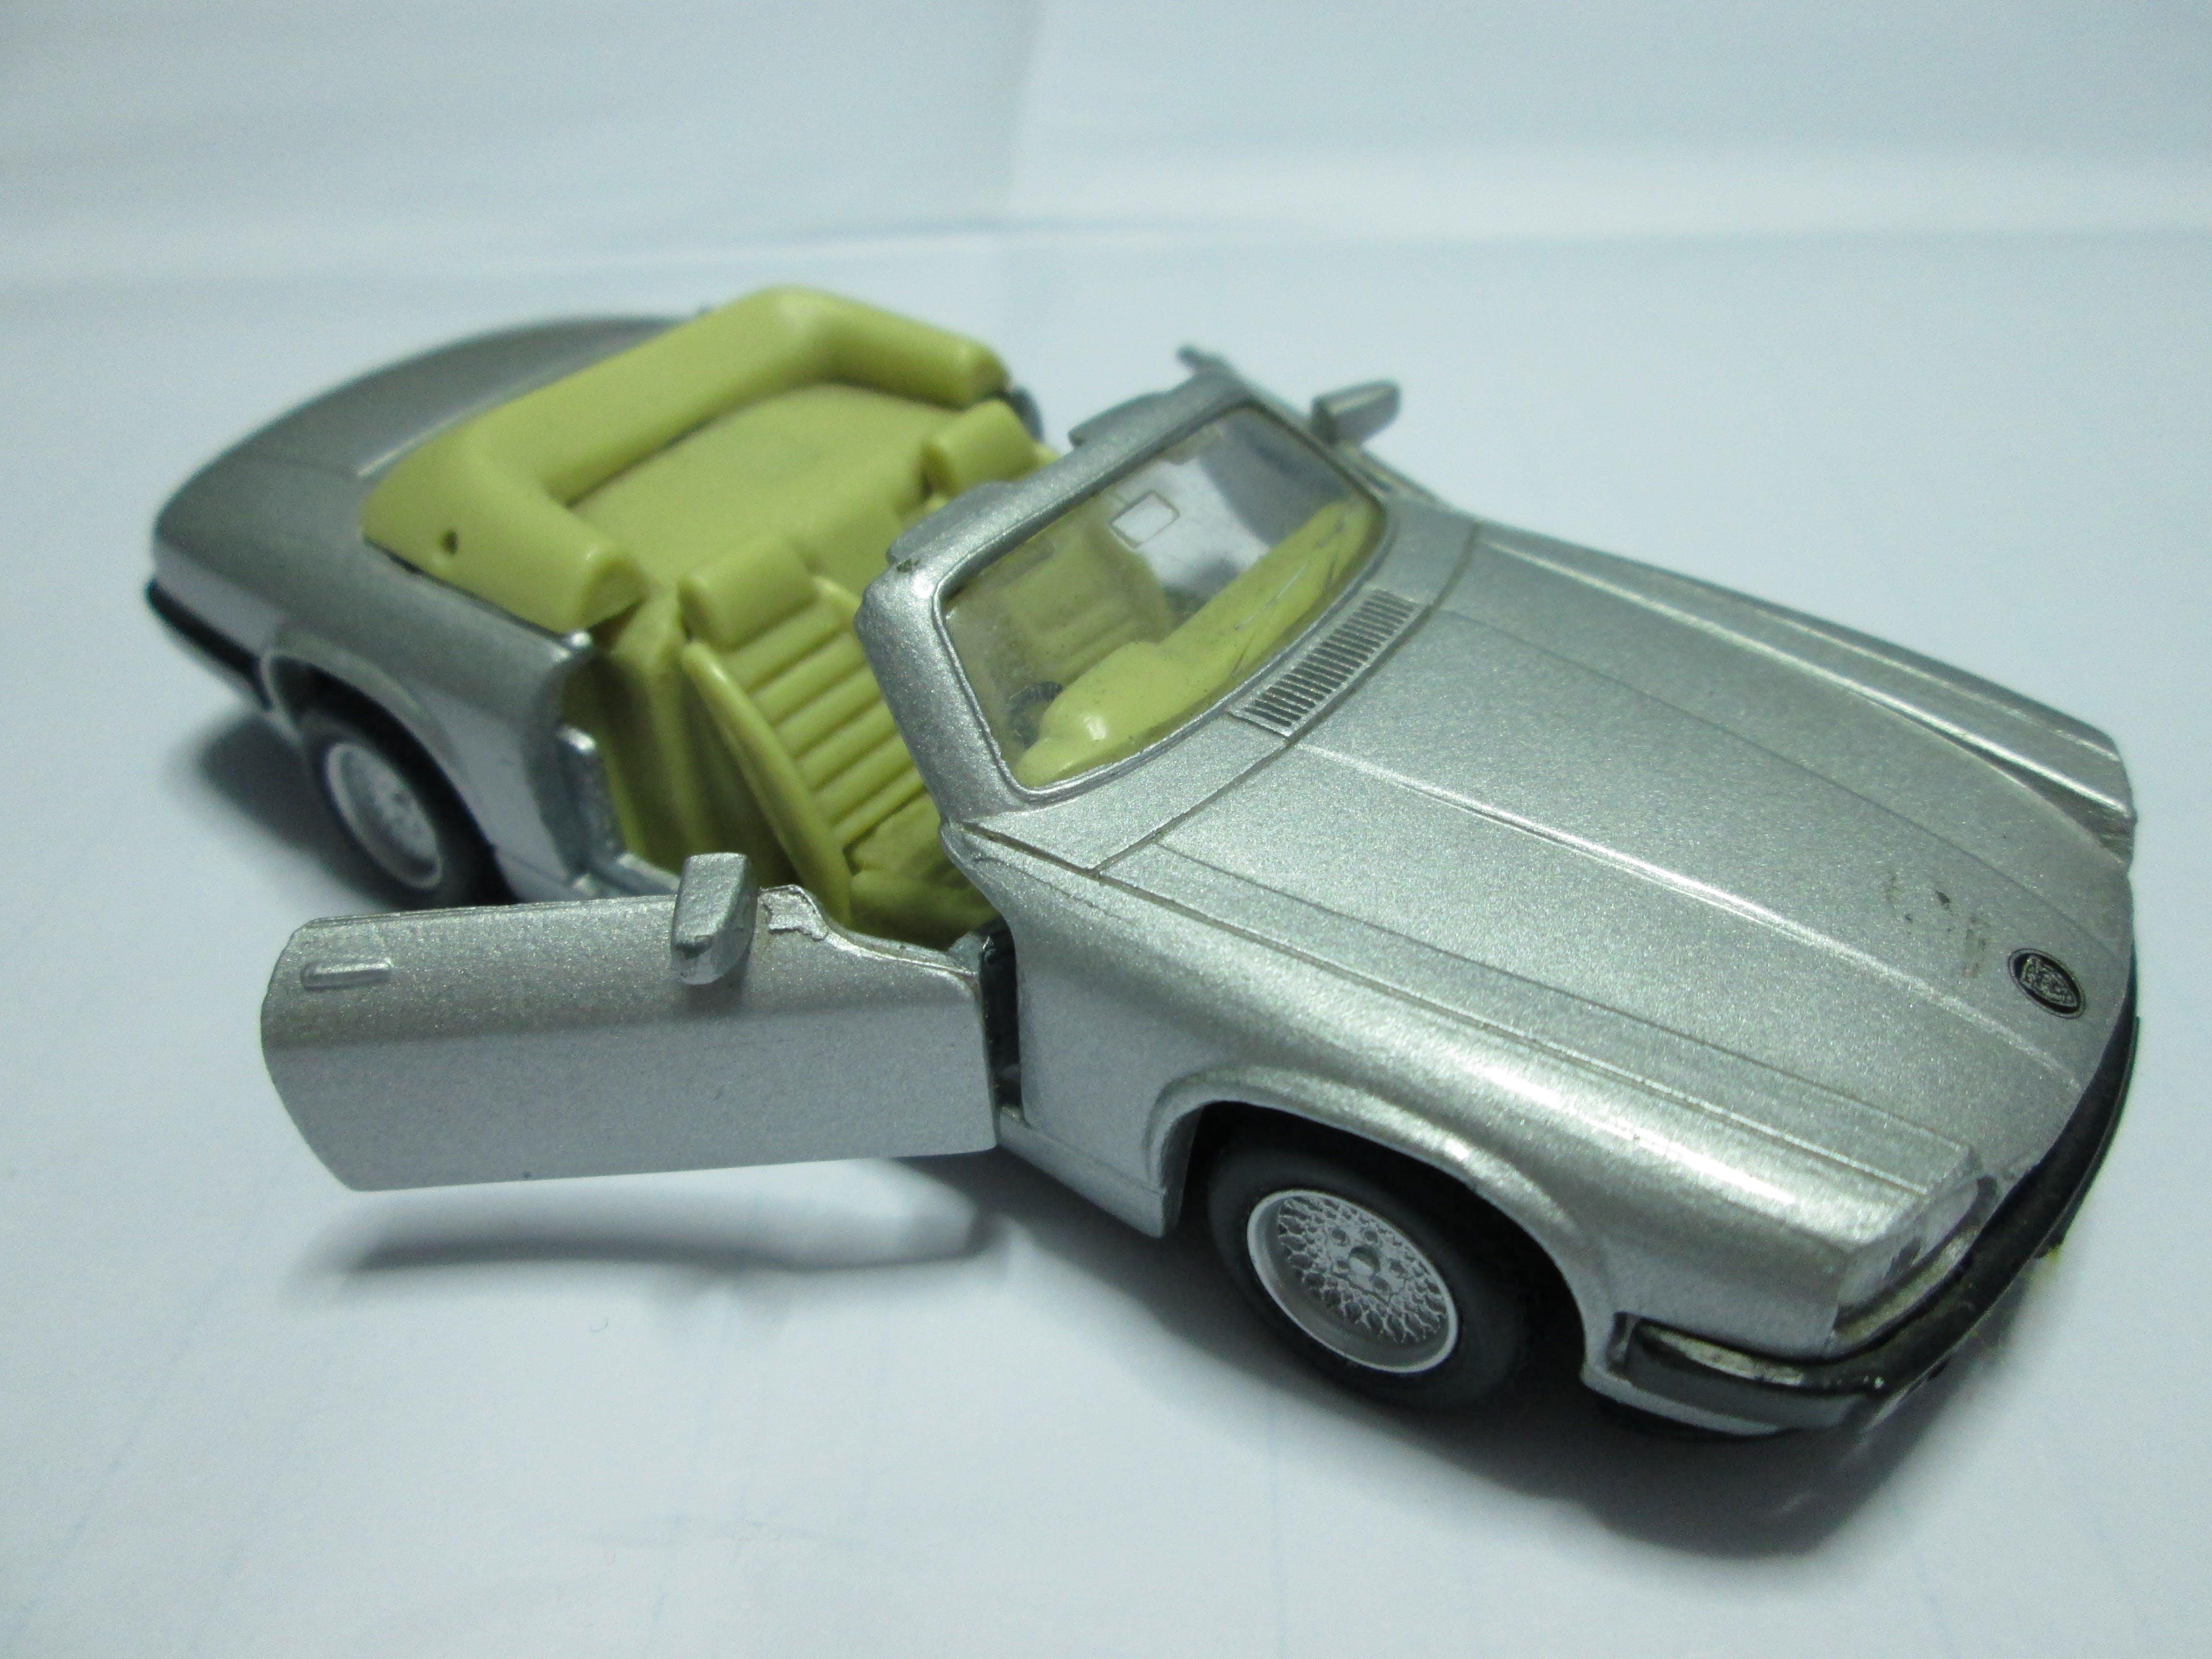 modellautos, spielzeugautos